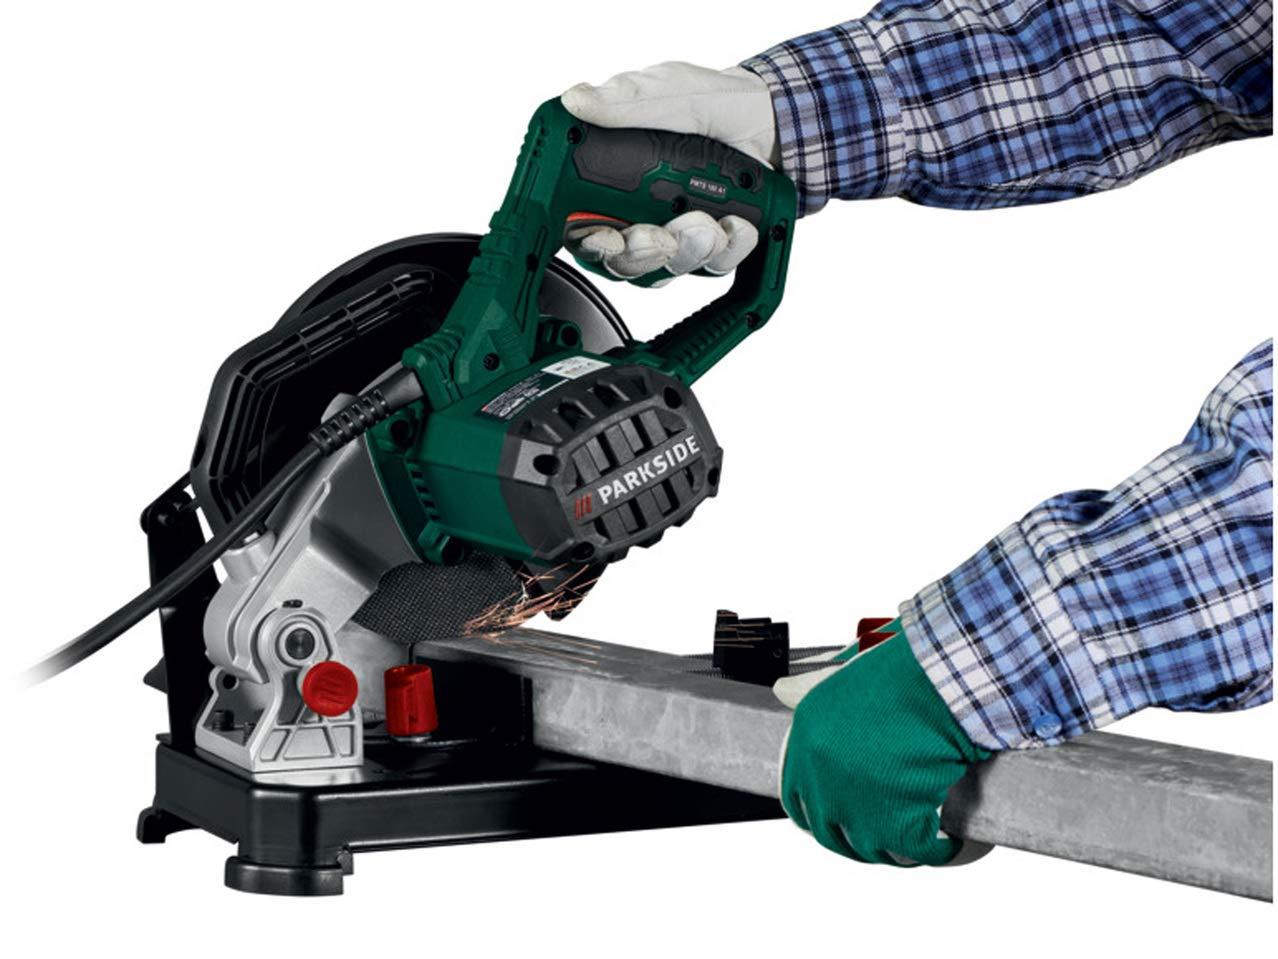 7700 RPM PMTS 180 A1 Parkside 1280W Metal Cut-Off Grinder Mitre Saw